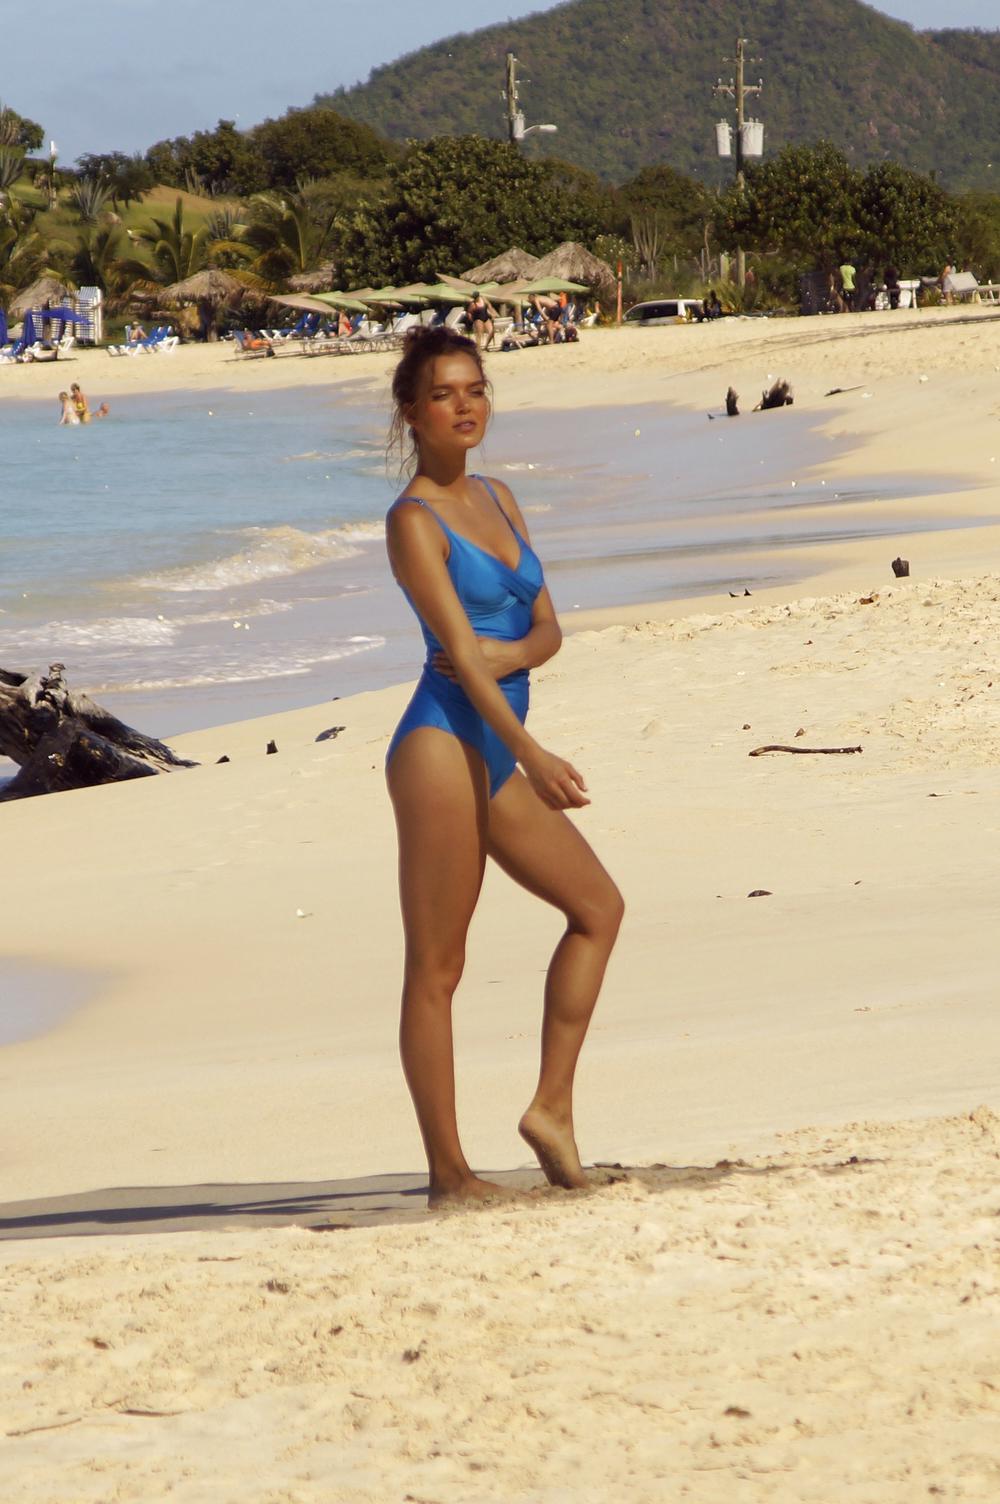 Gatecrashing a swimwear shoot at Ffryes beach, Antigua